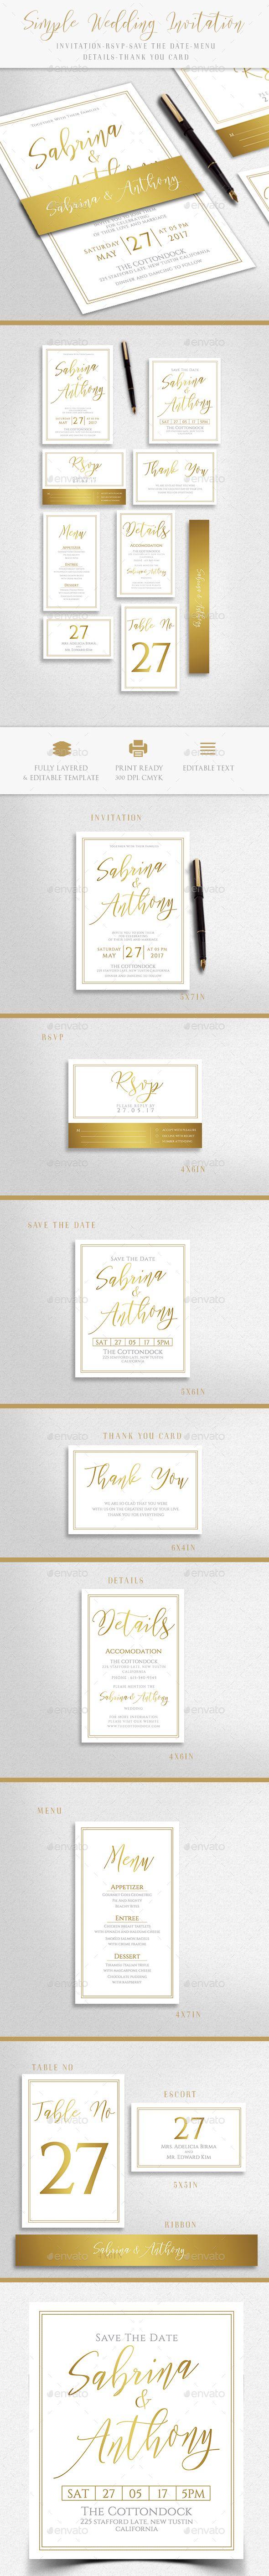 Wedding Invitation Card Template PSD | Card & Invite Design ...